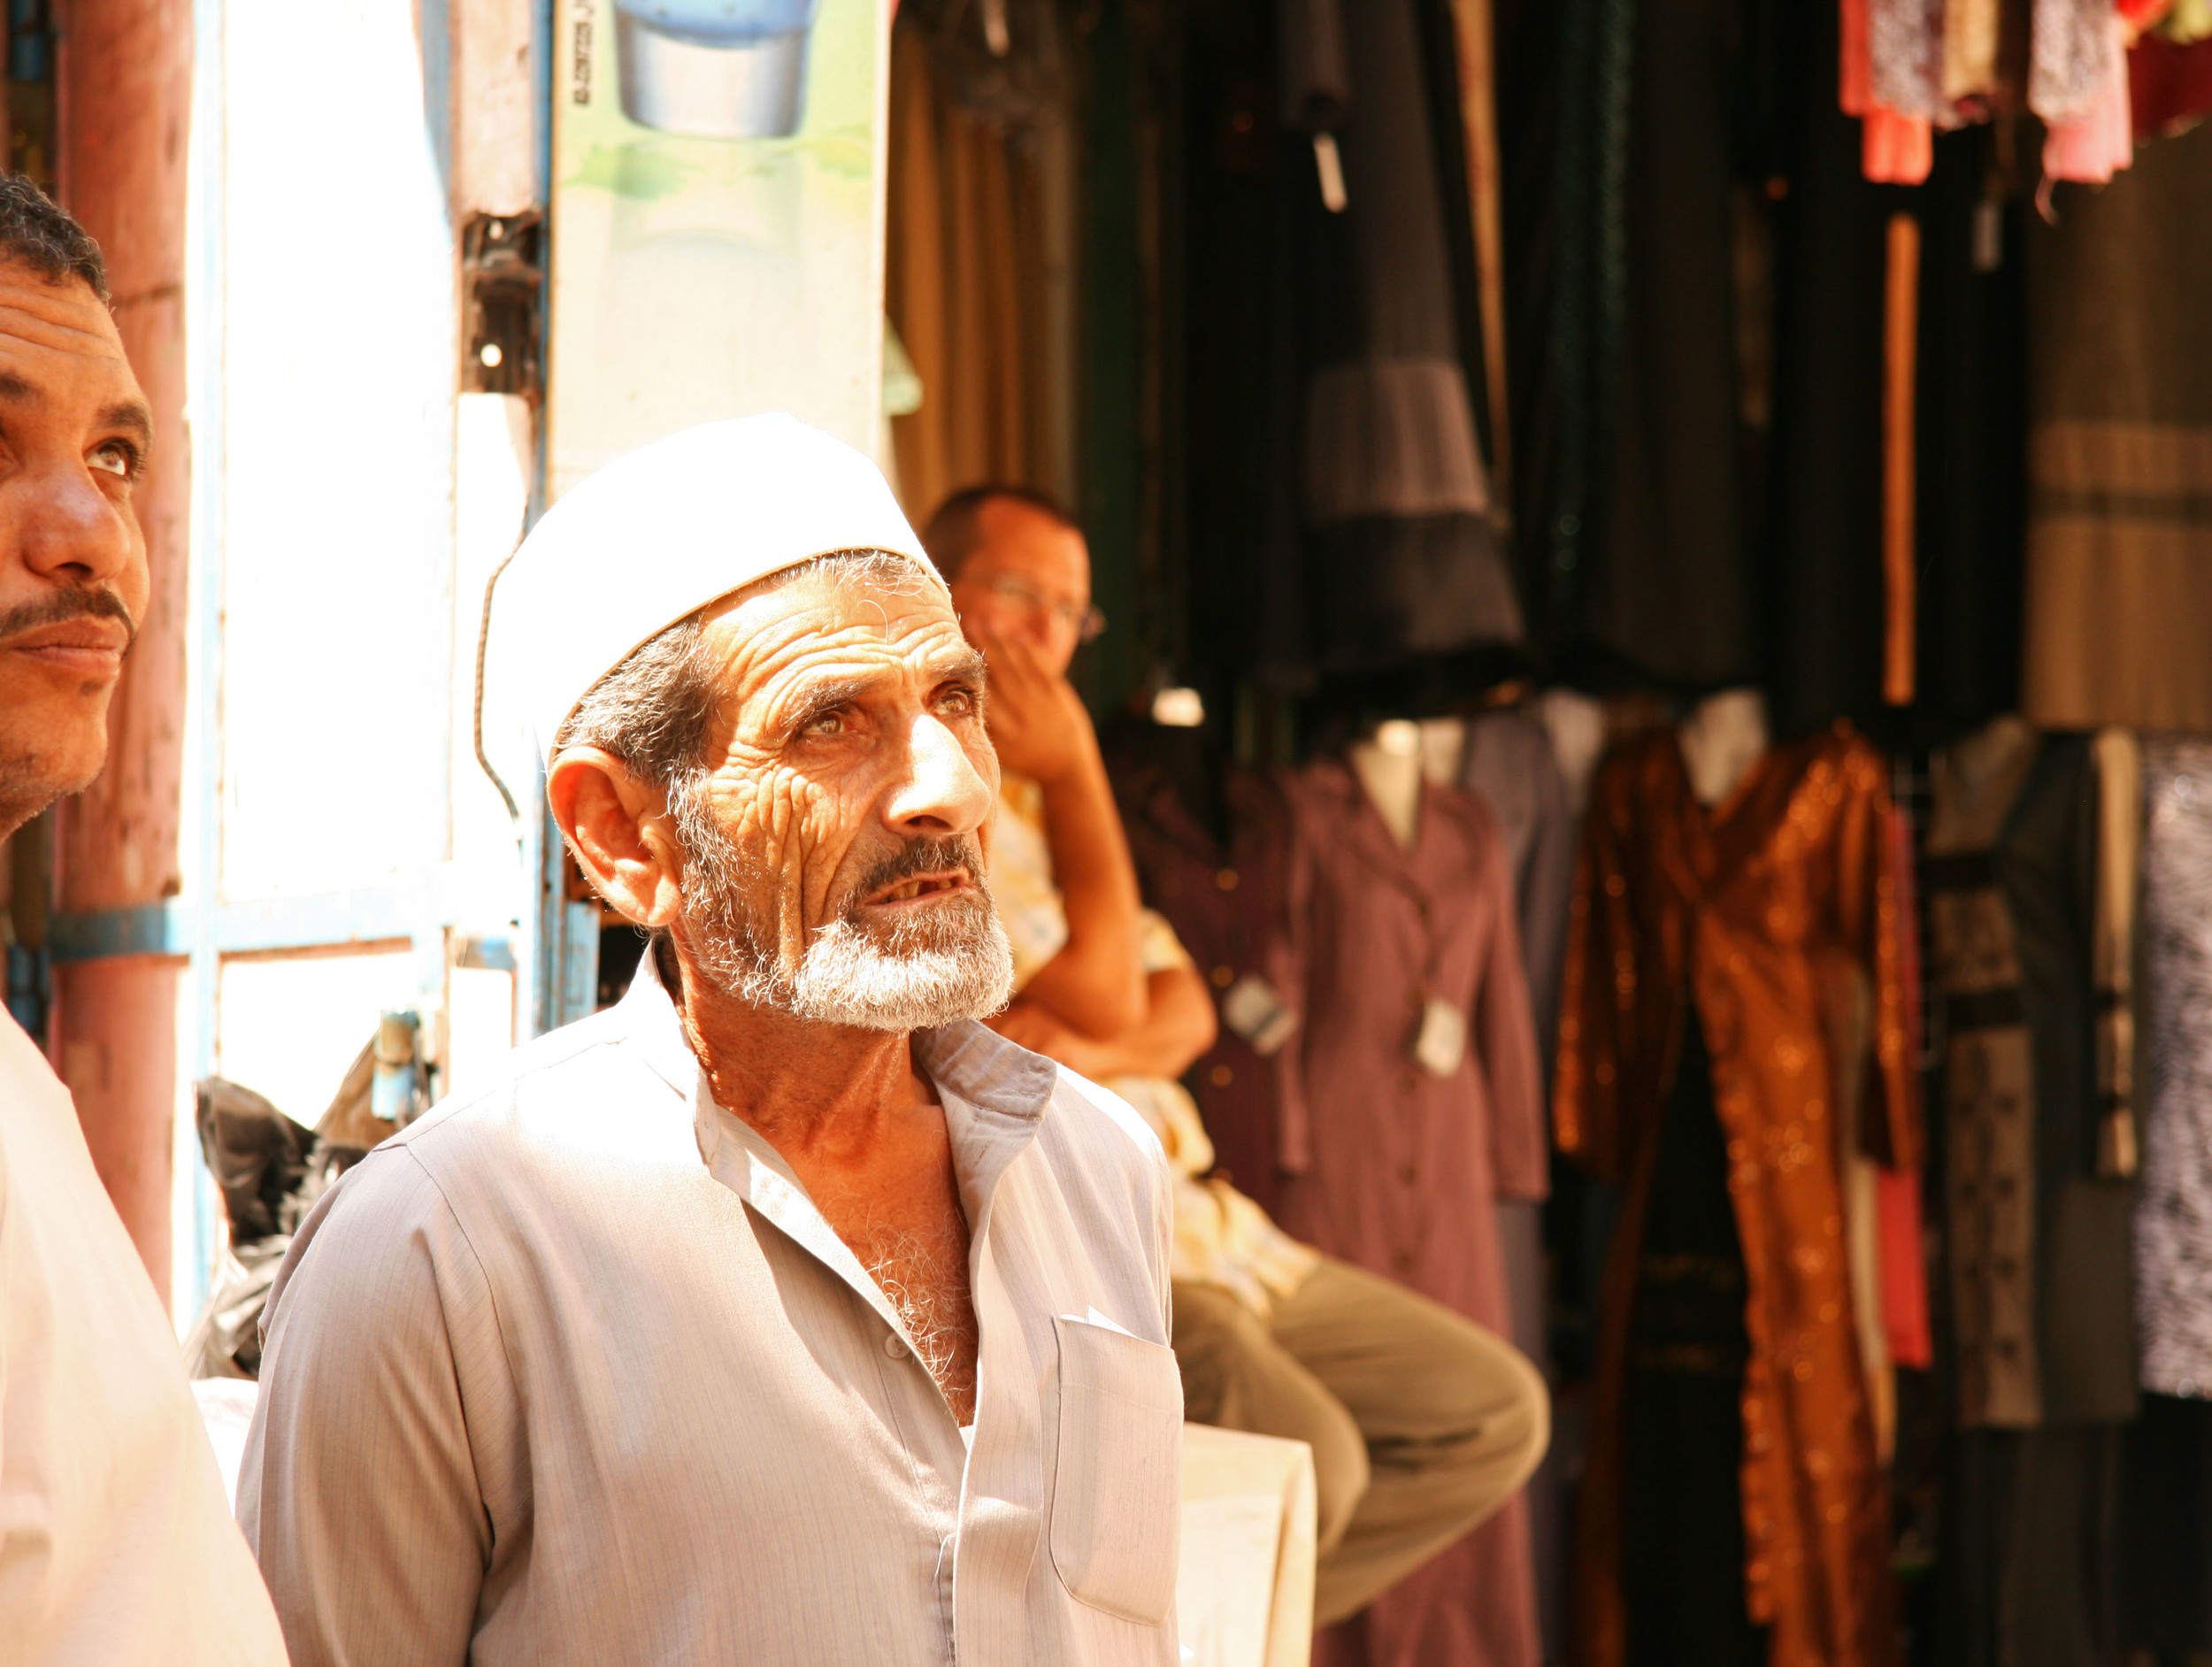 Vendor in the Arab Market